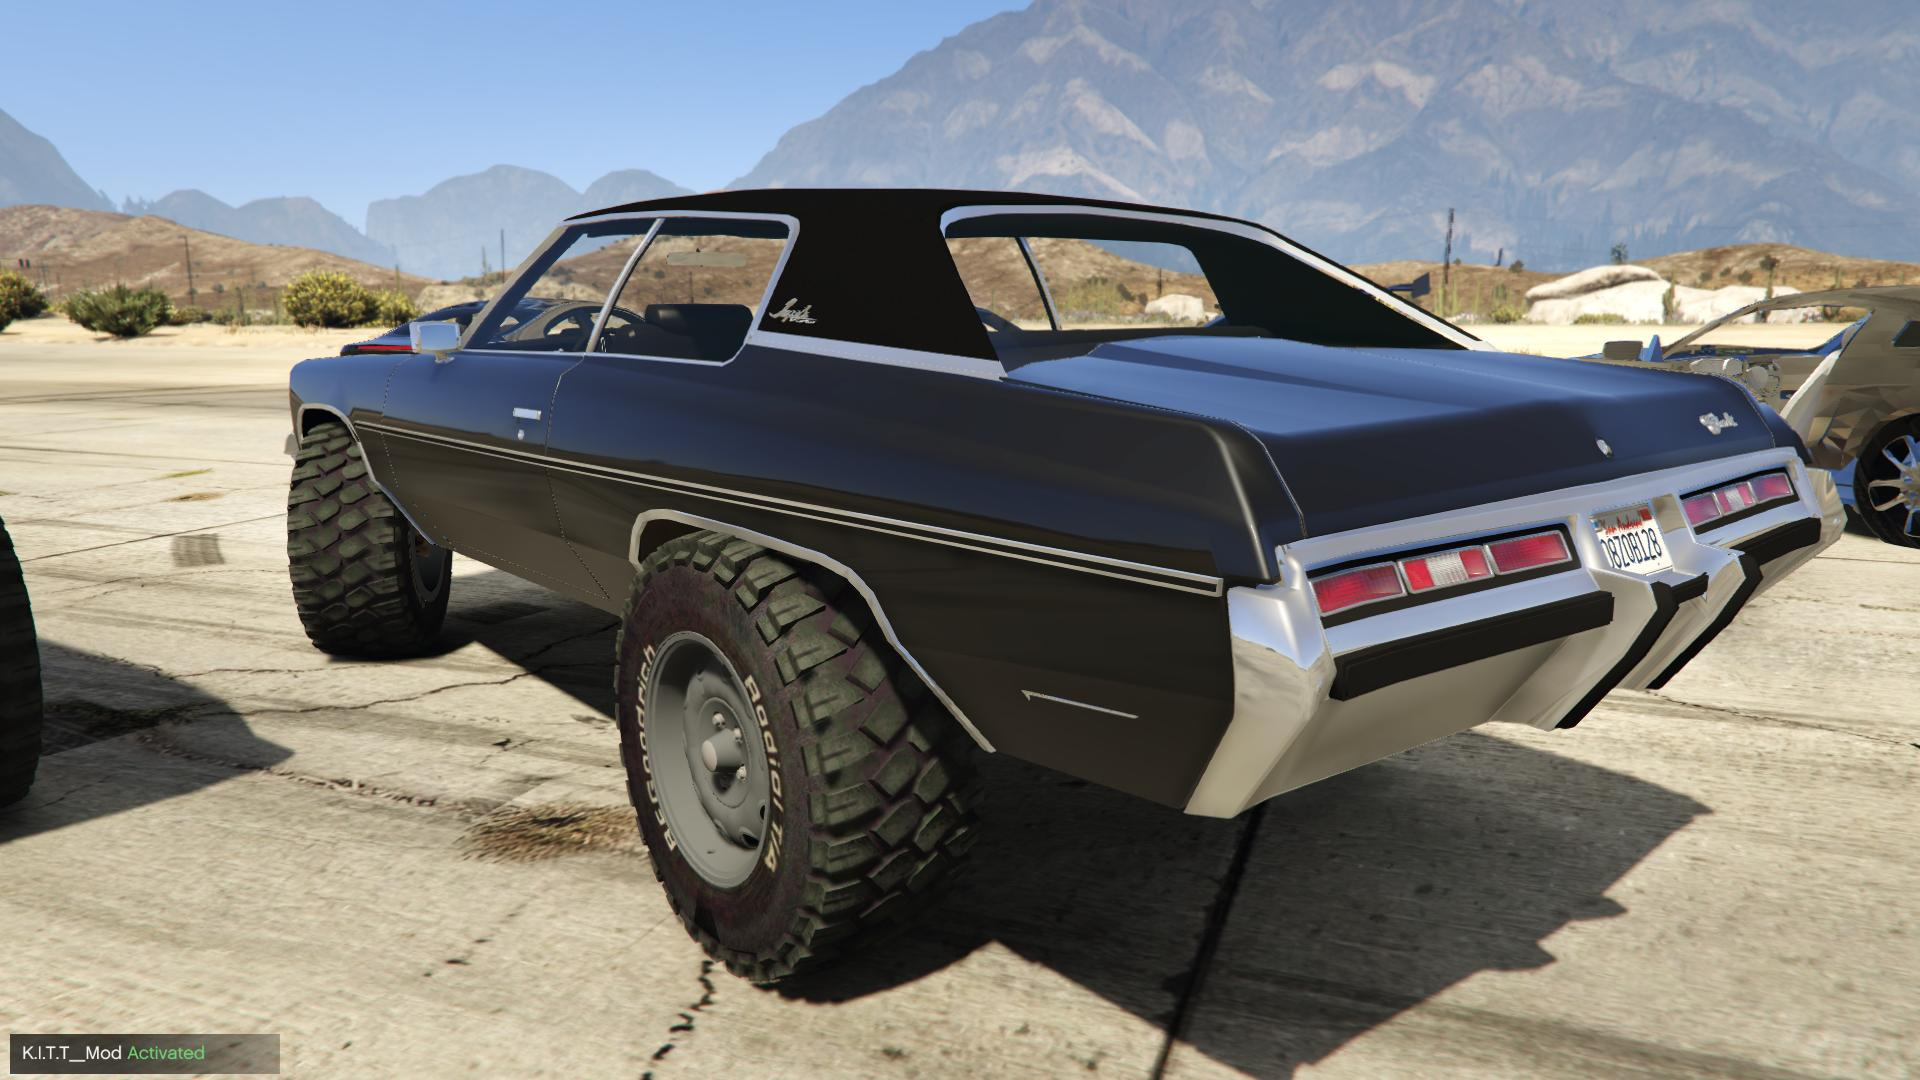 Chevrolet Impala 1972 Offroad [Tuning | Unlocked] - GTA5